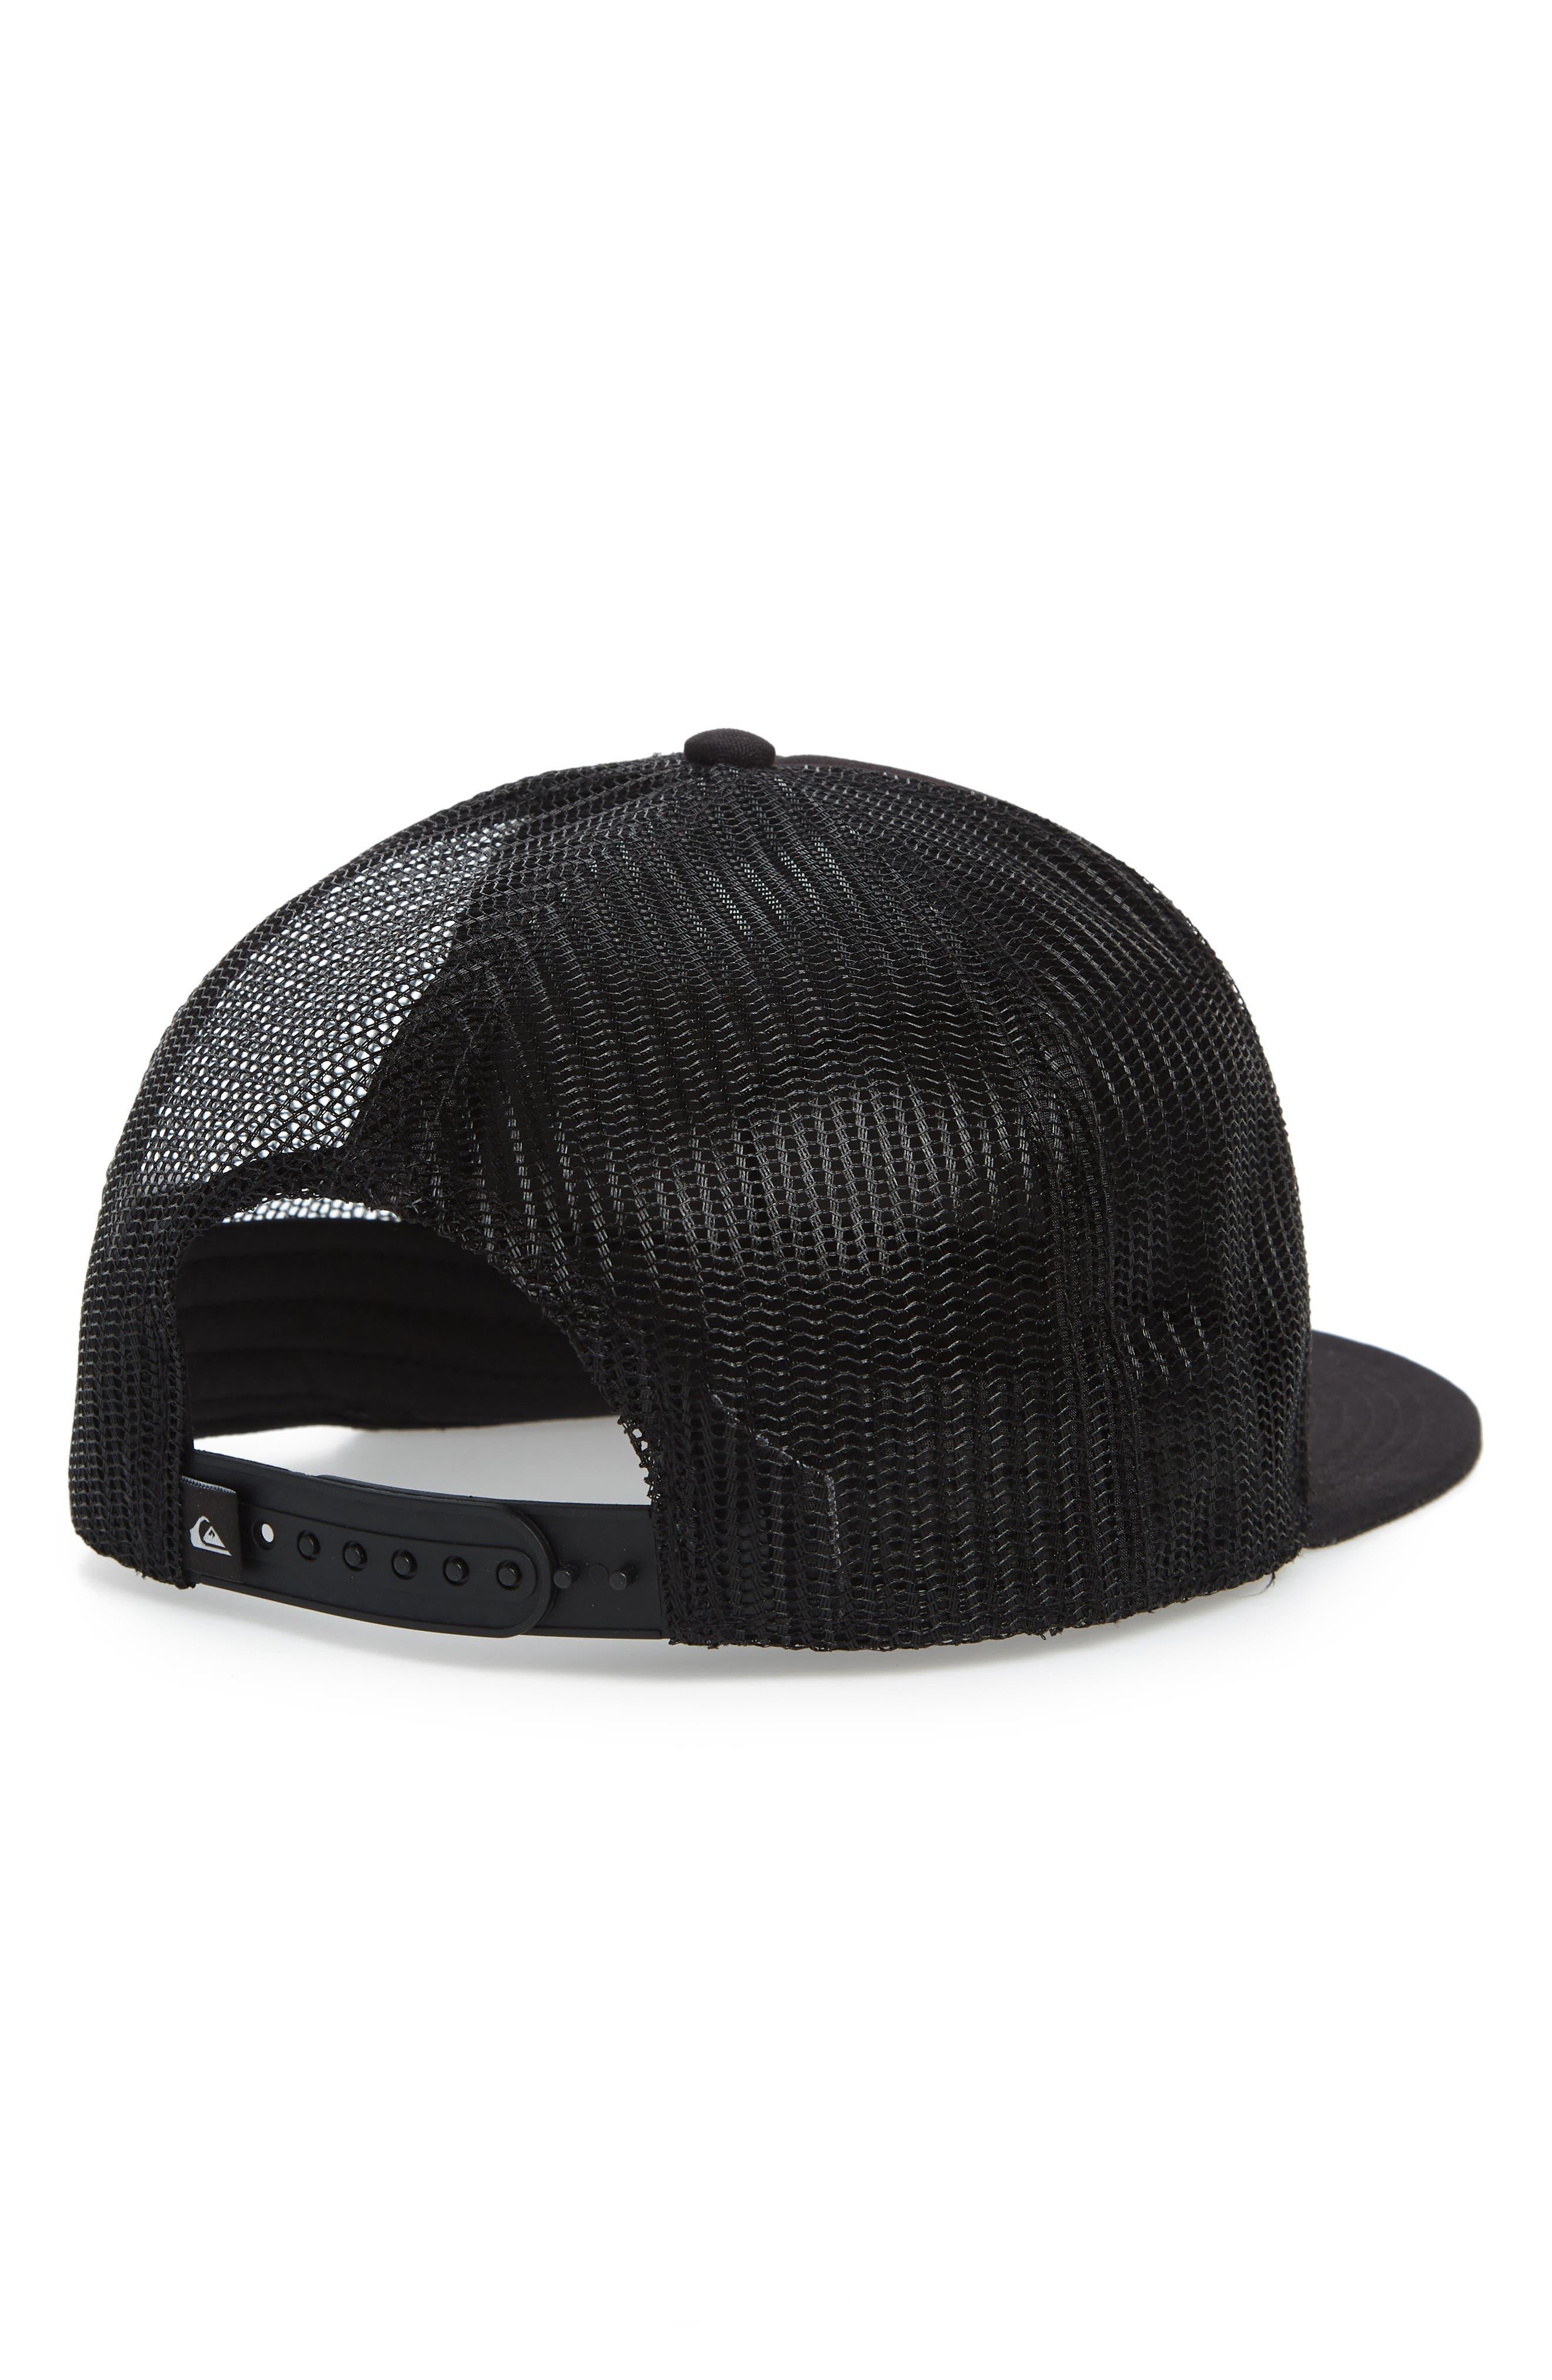 Past Checker Trucker Hat,                             Alternate thumbnail 2, color,                             BLACK